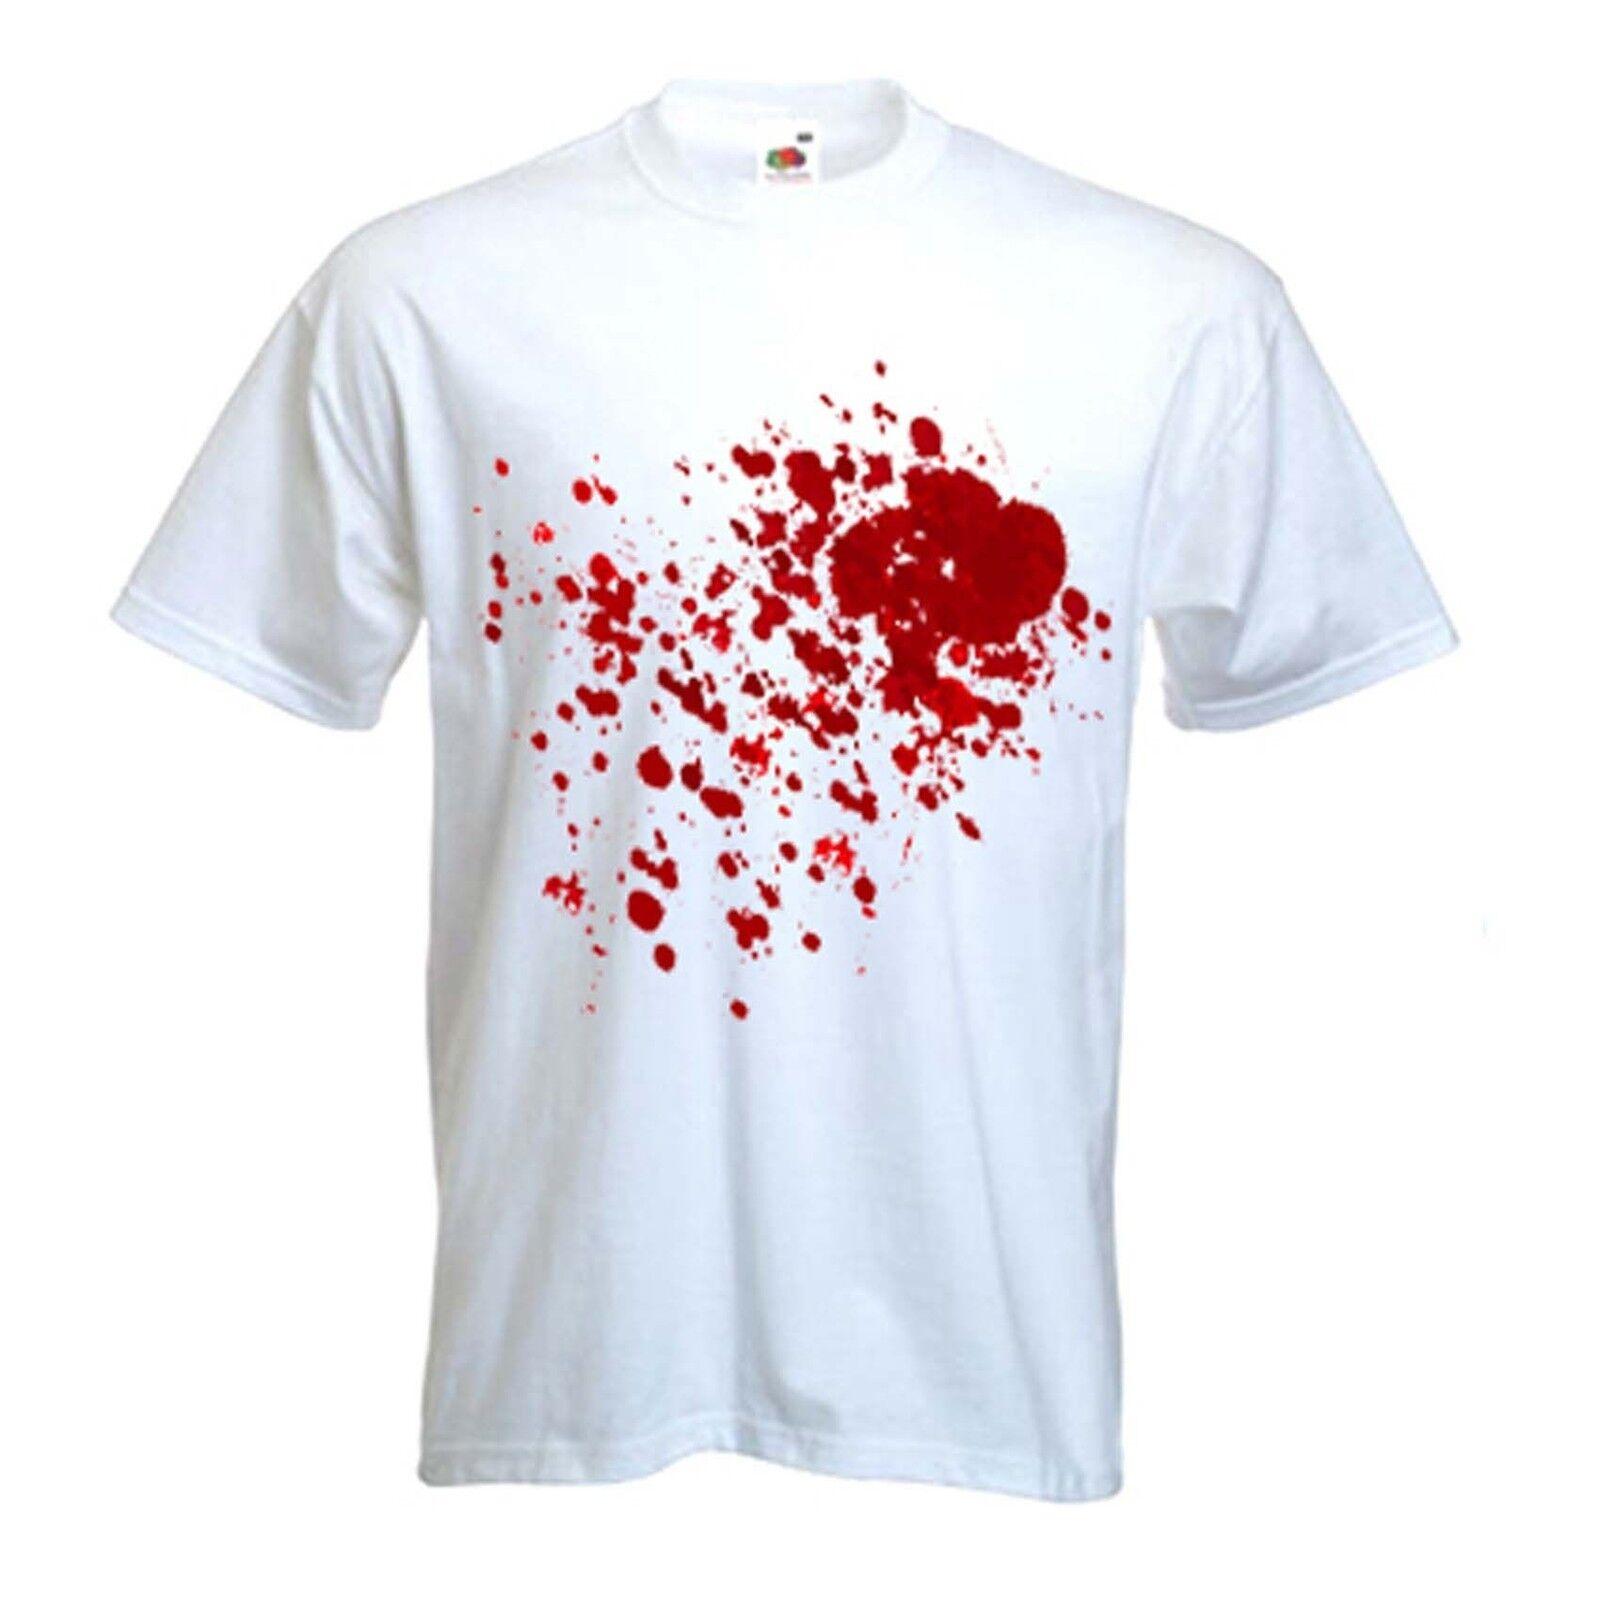 BLOOD SPLATTER MEN'S FANCY DRESS T-SHIRT - Vampire Zombies Dexter Vampires  Men Women Unisex Fashion tshirt Free Shipping